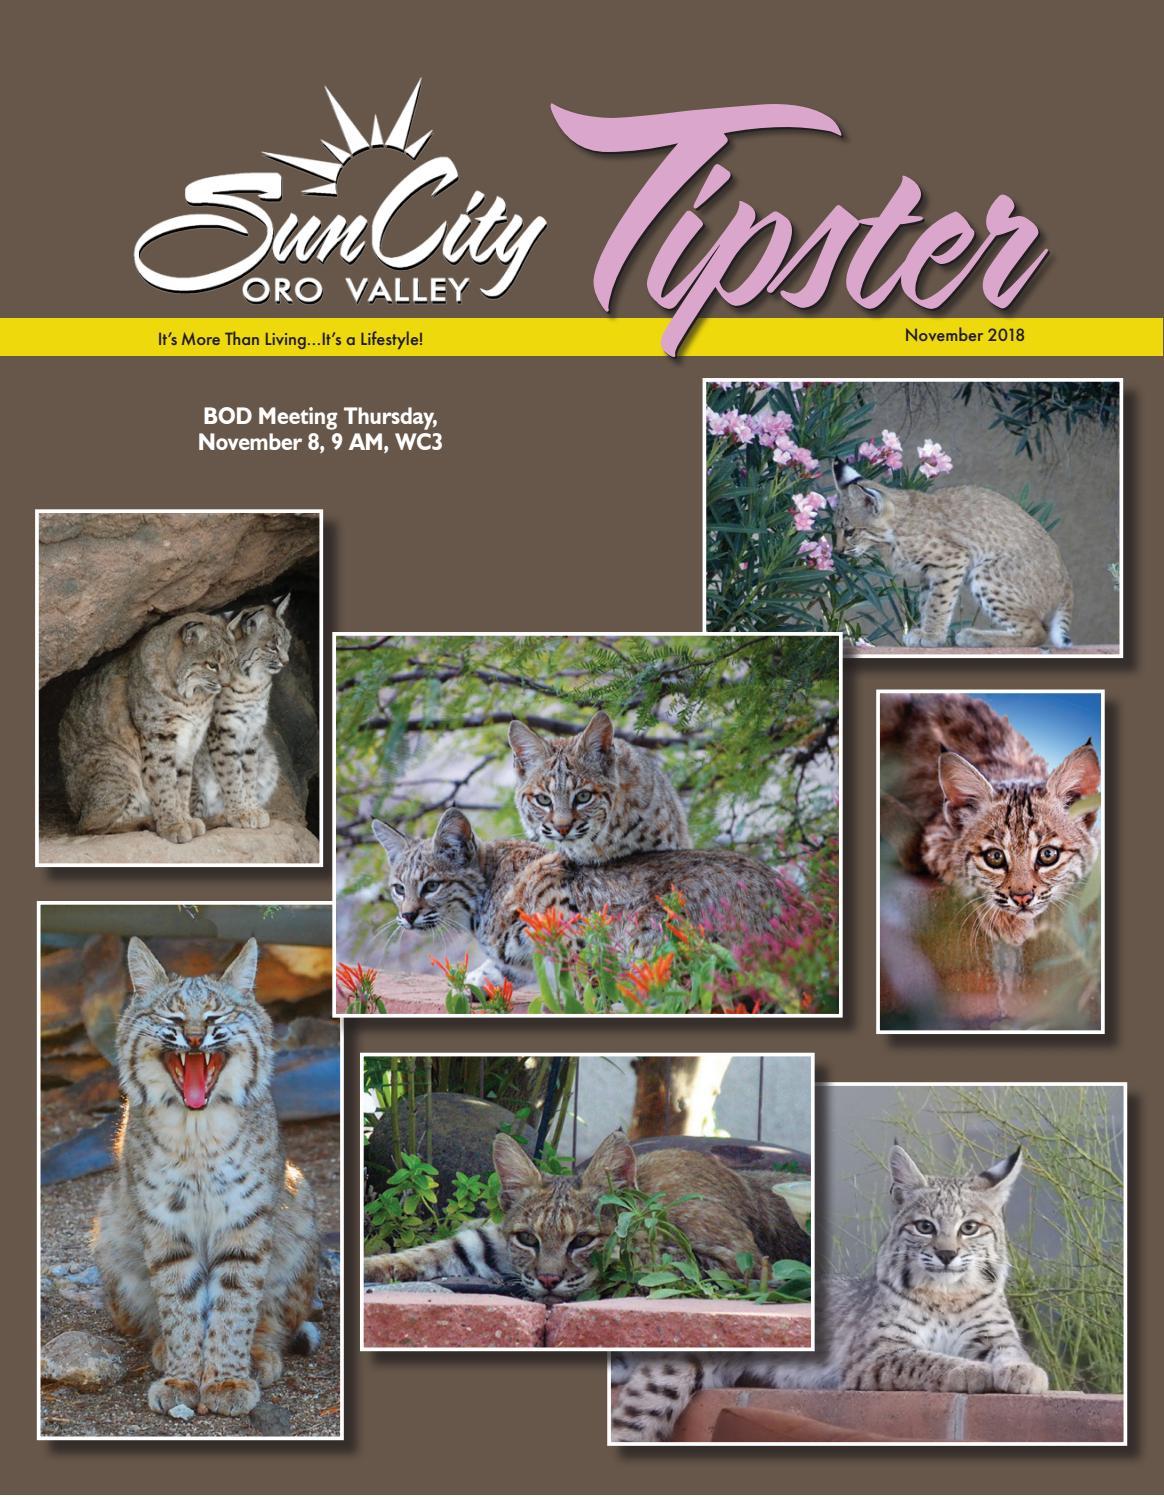 Sun City Oro Valley Tipster November 2018 by Sun City Oro